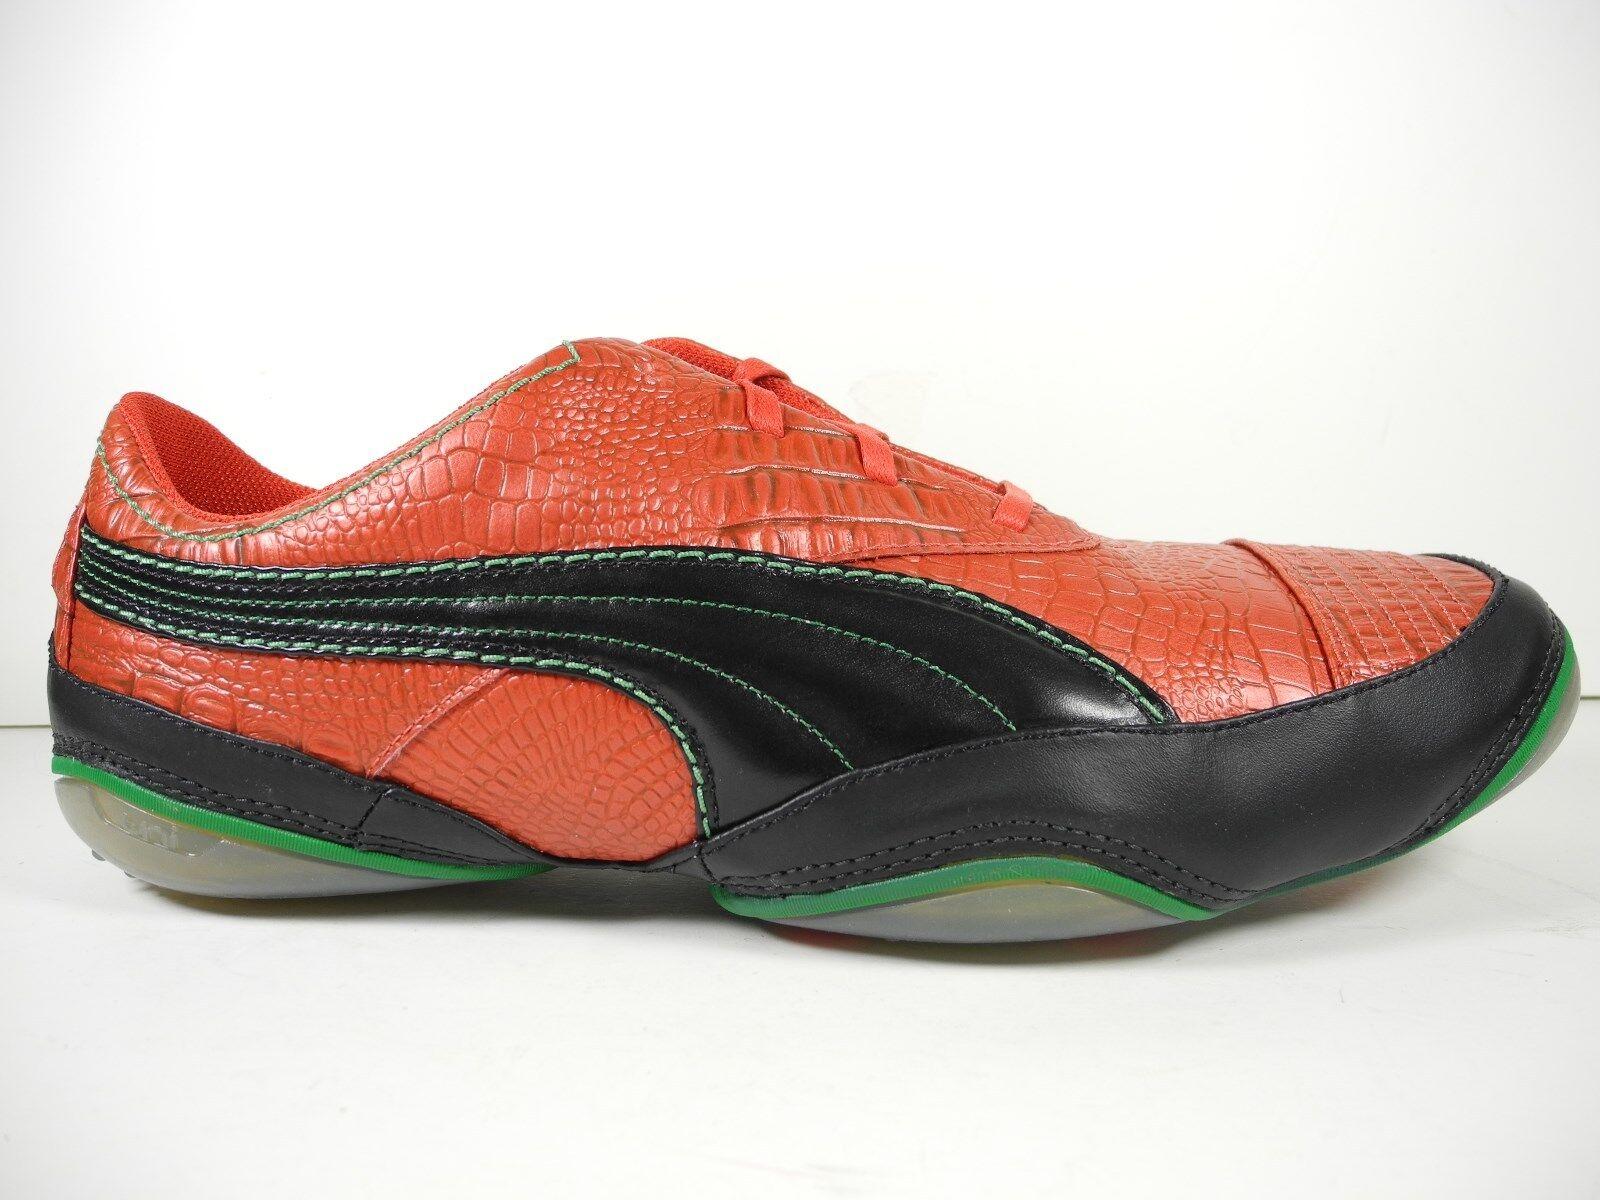 NEW Puma Puma NEW USAN METALLIC CROC Homme Chaussures 25970f